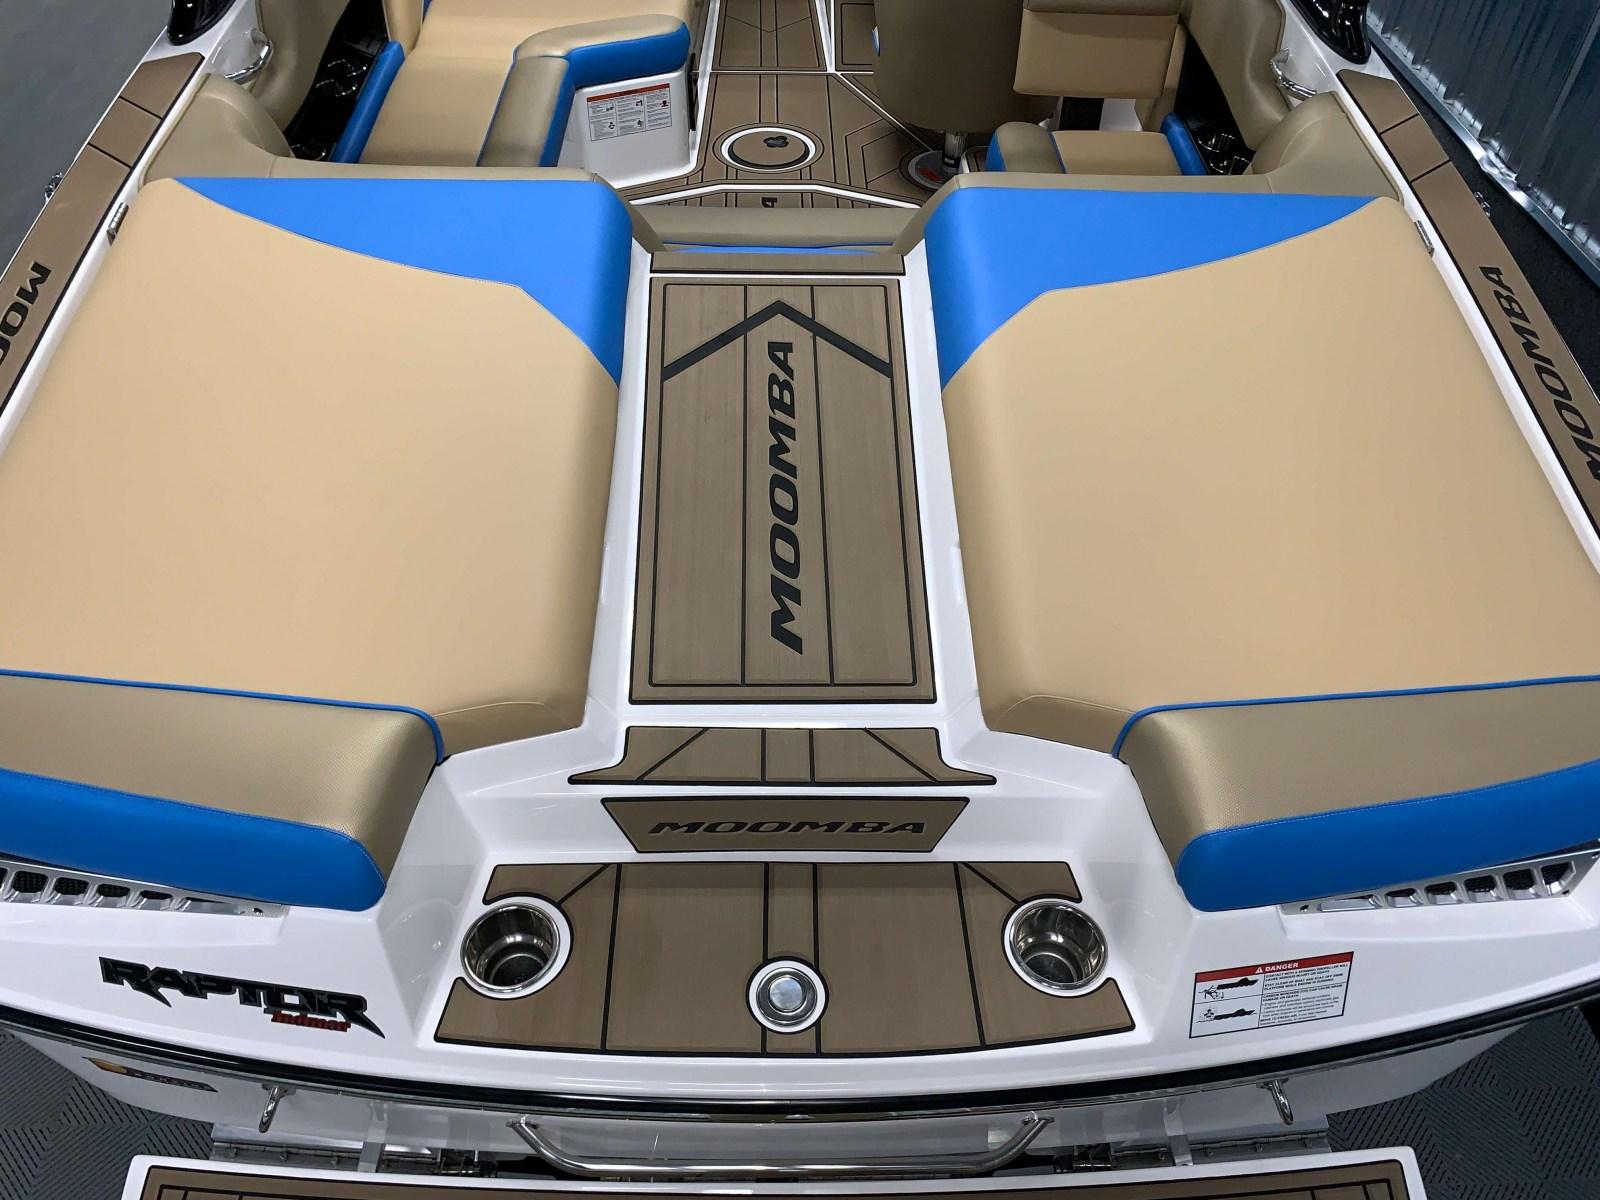 Transom Seating of the 2021 Moomba Mondo Wake Boat